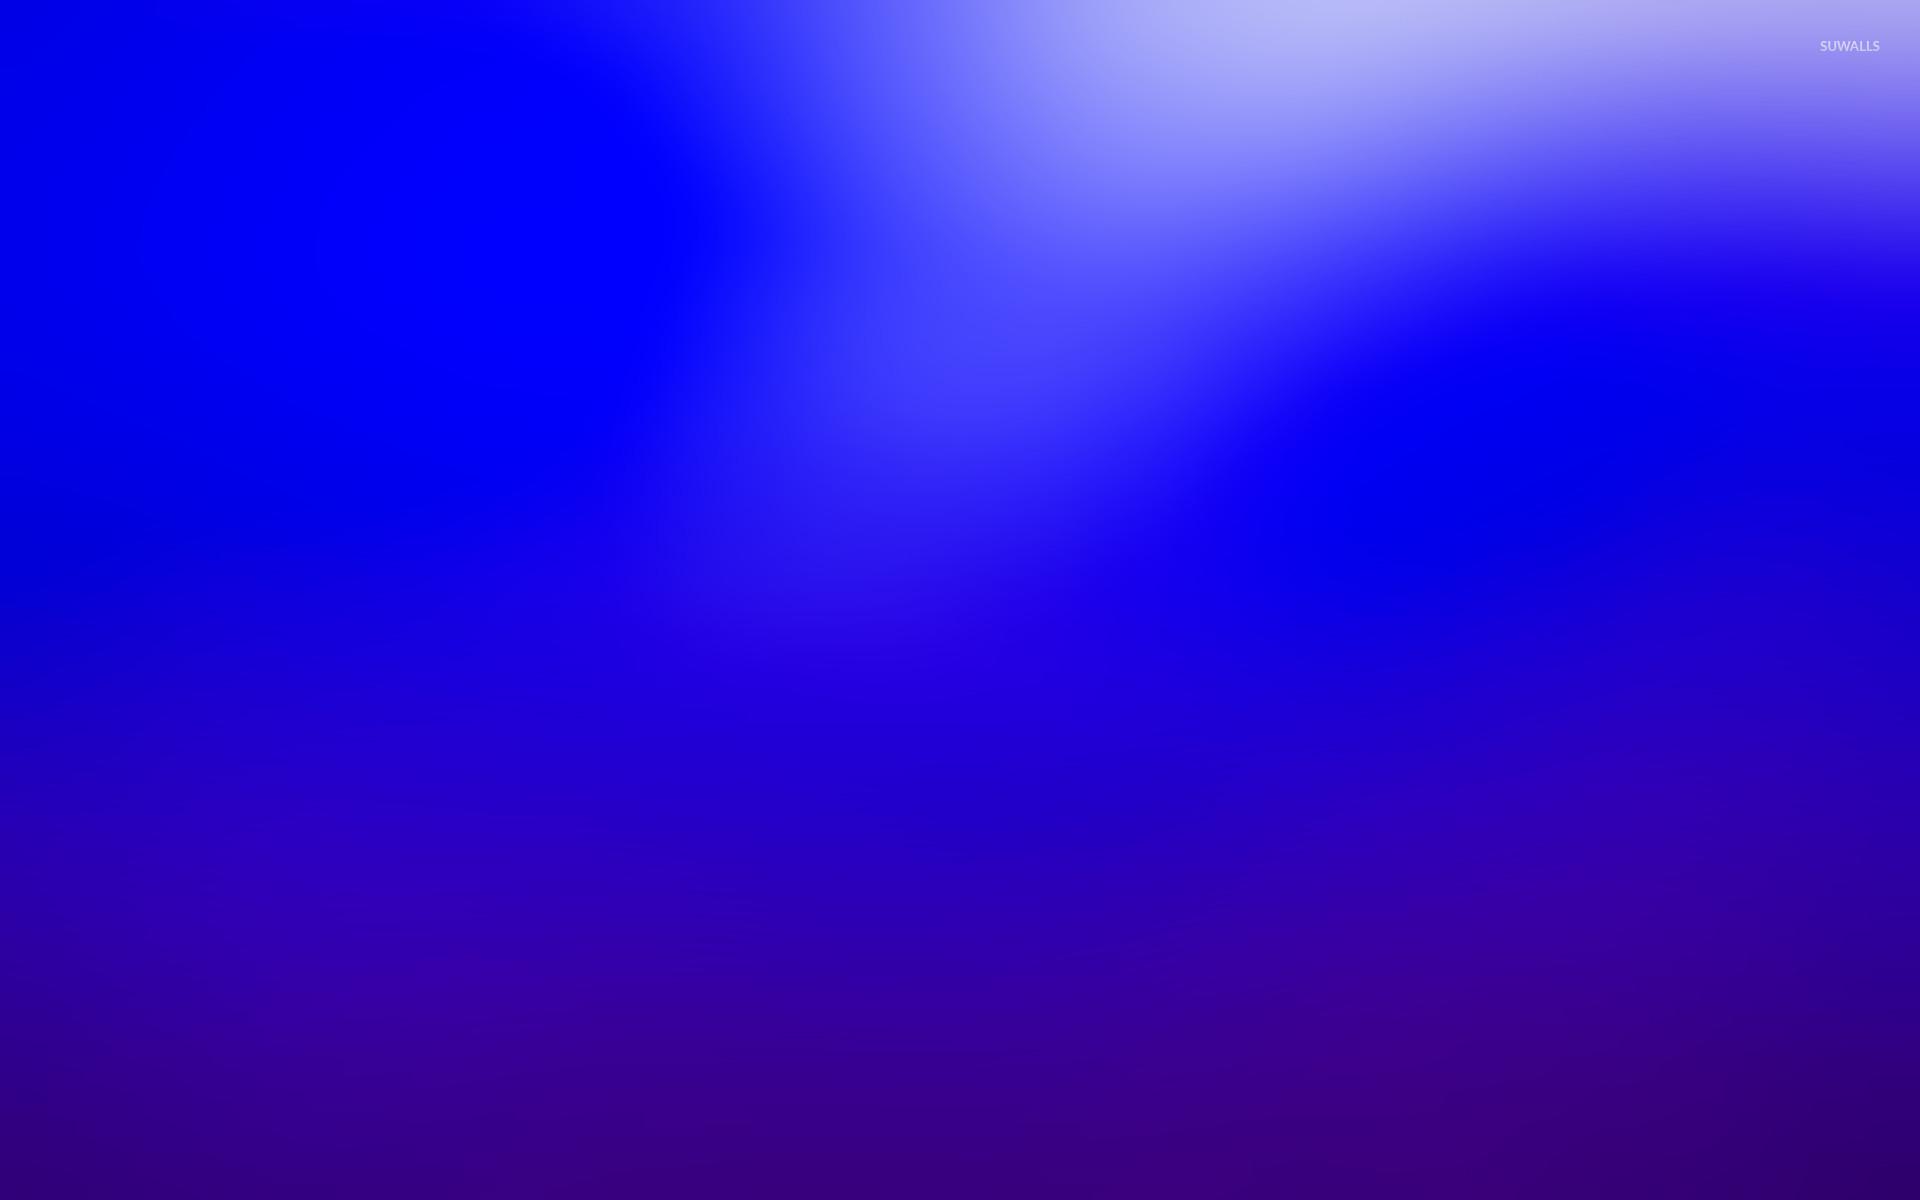 Blue gradient [2] wallpaper jpg